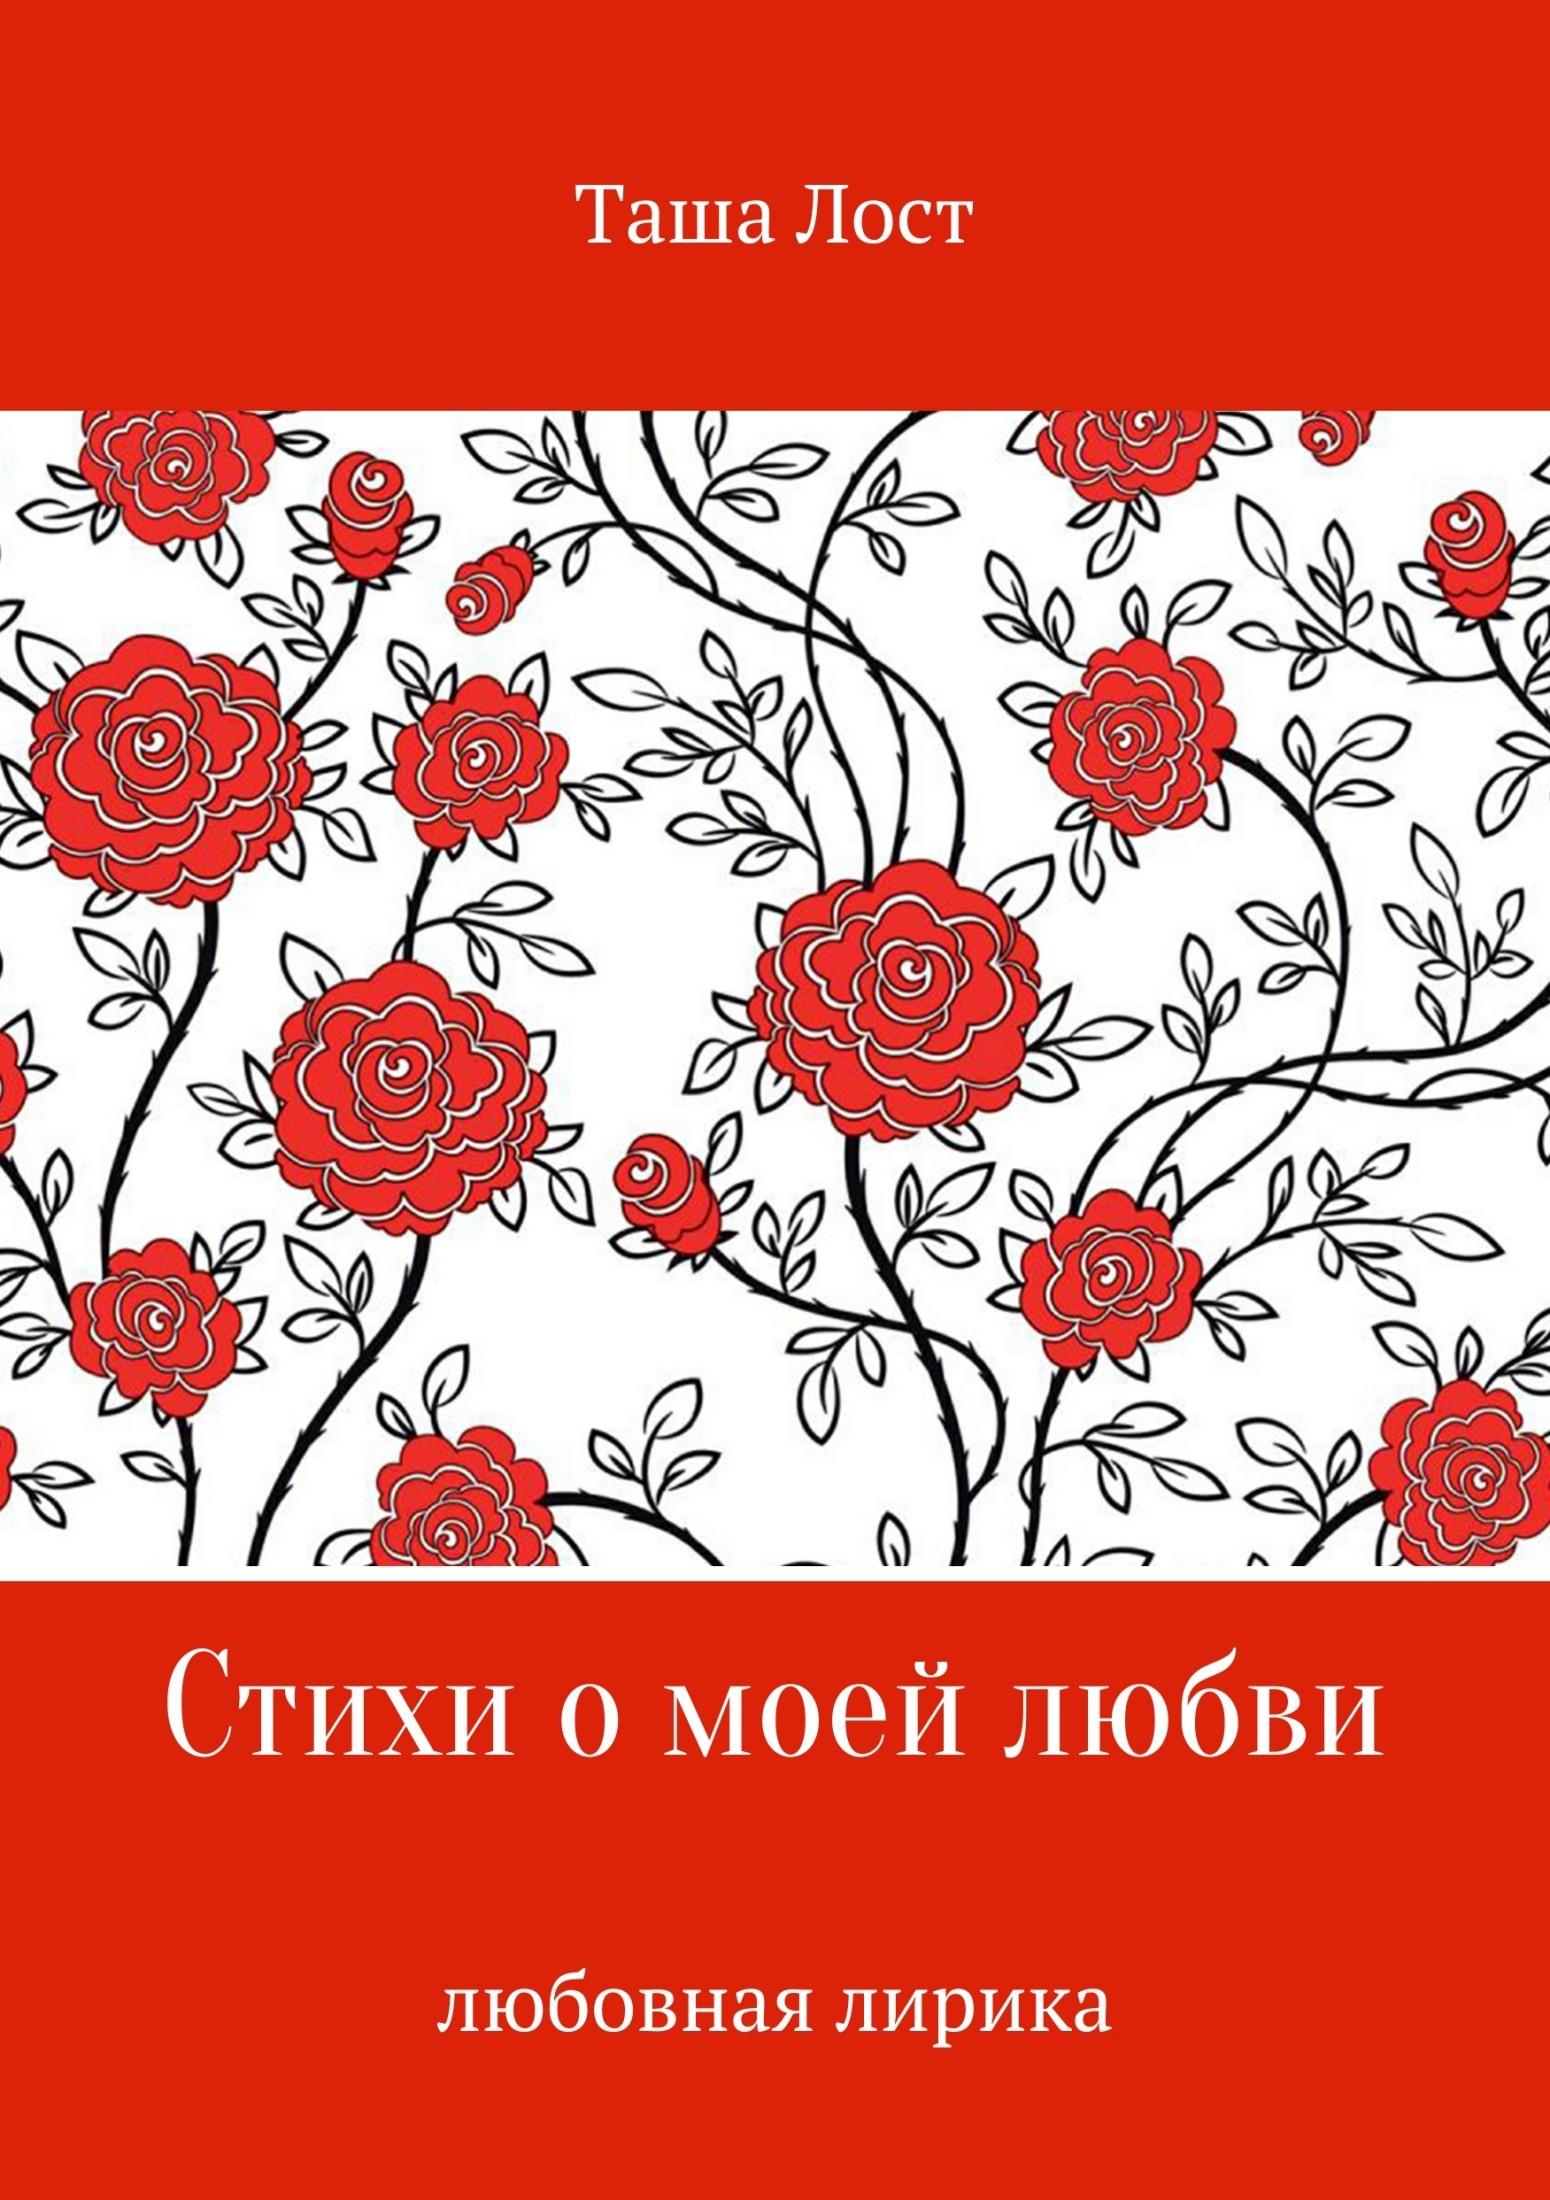 купить Tasha Lost Стихи о моей любви по цене 0 рублей